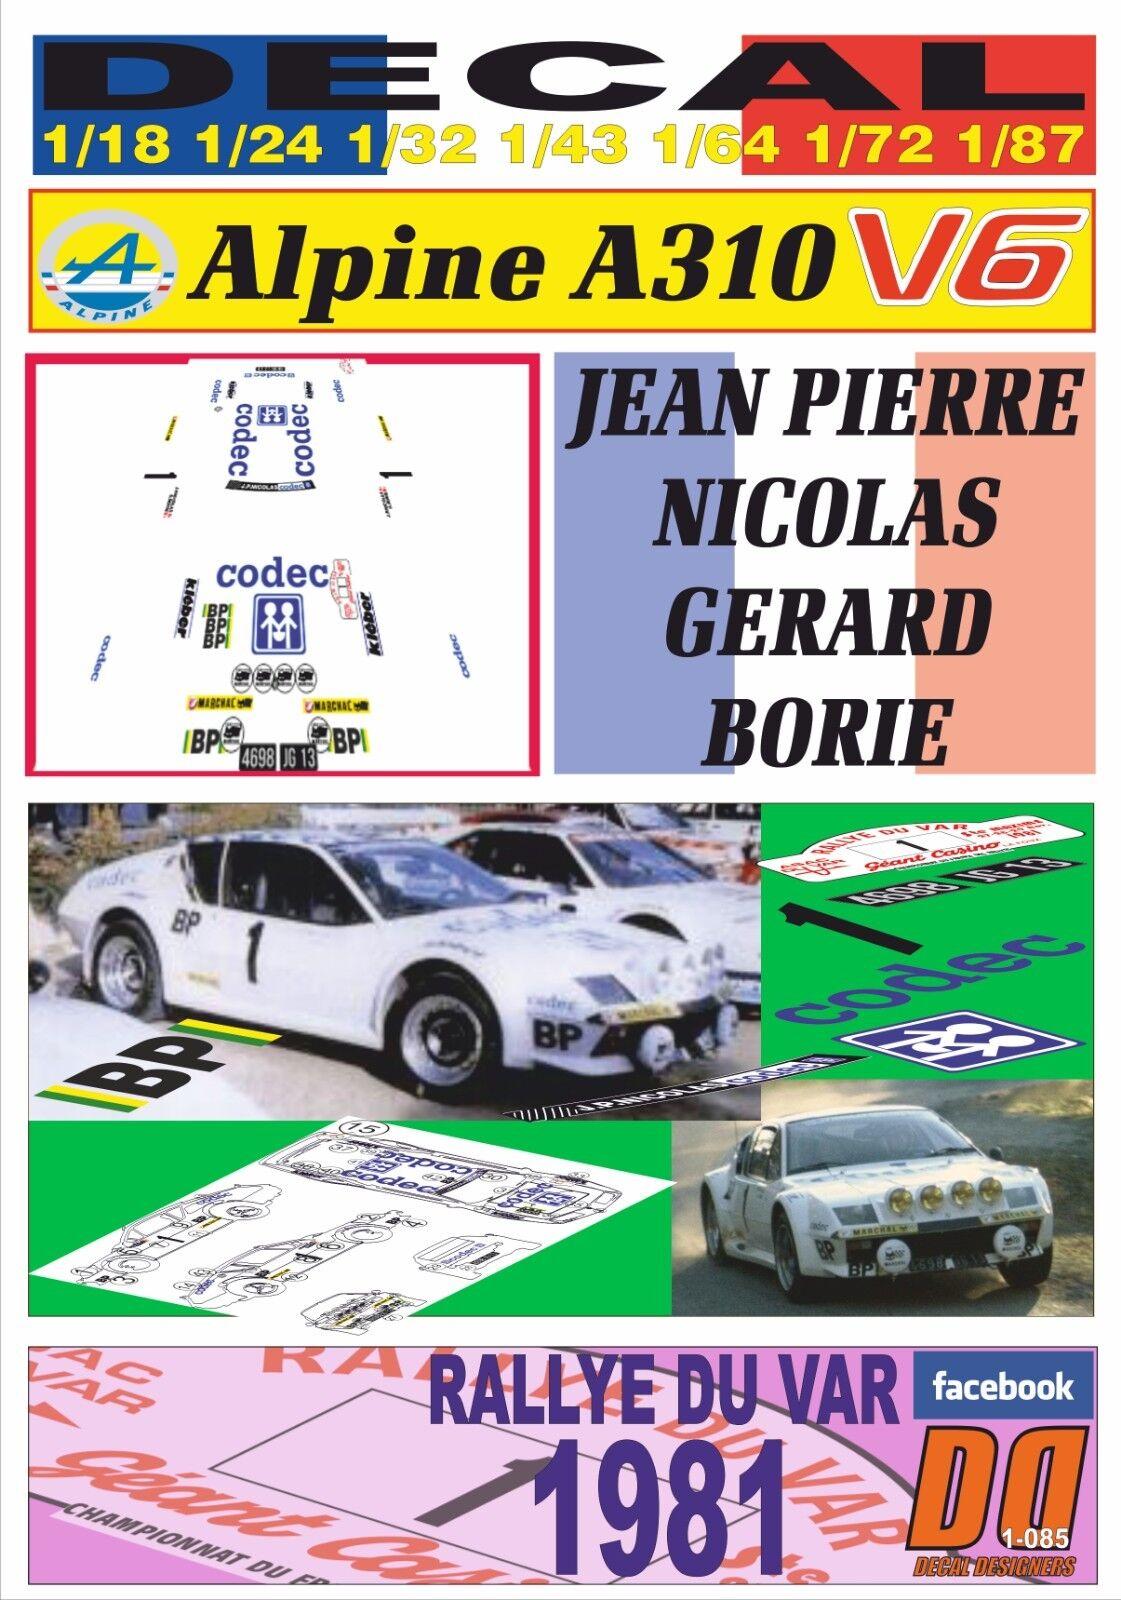 DECAL RENAULT ALPINE A310 V6 V6 V6 JEAN PIERRE NICOLAS R. DU VAR 1981 DnF (01) cb0356